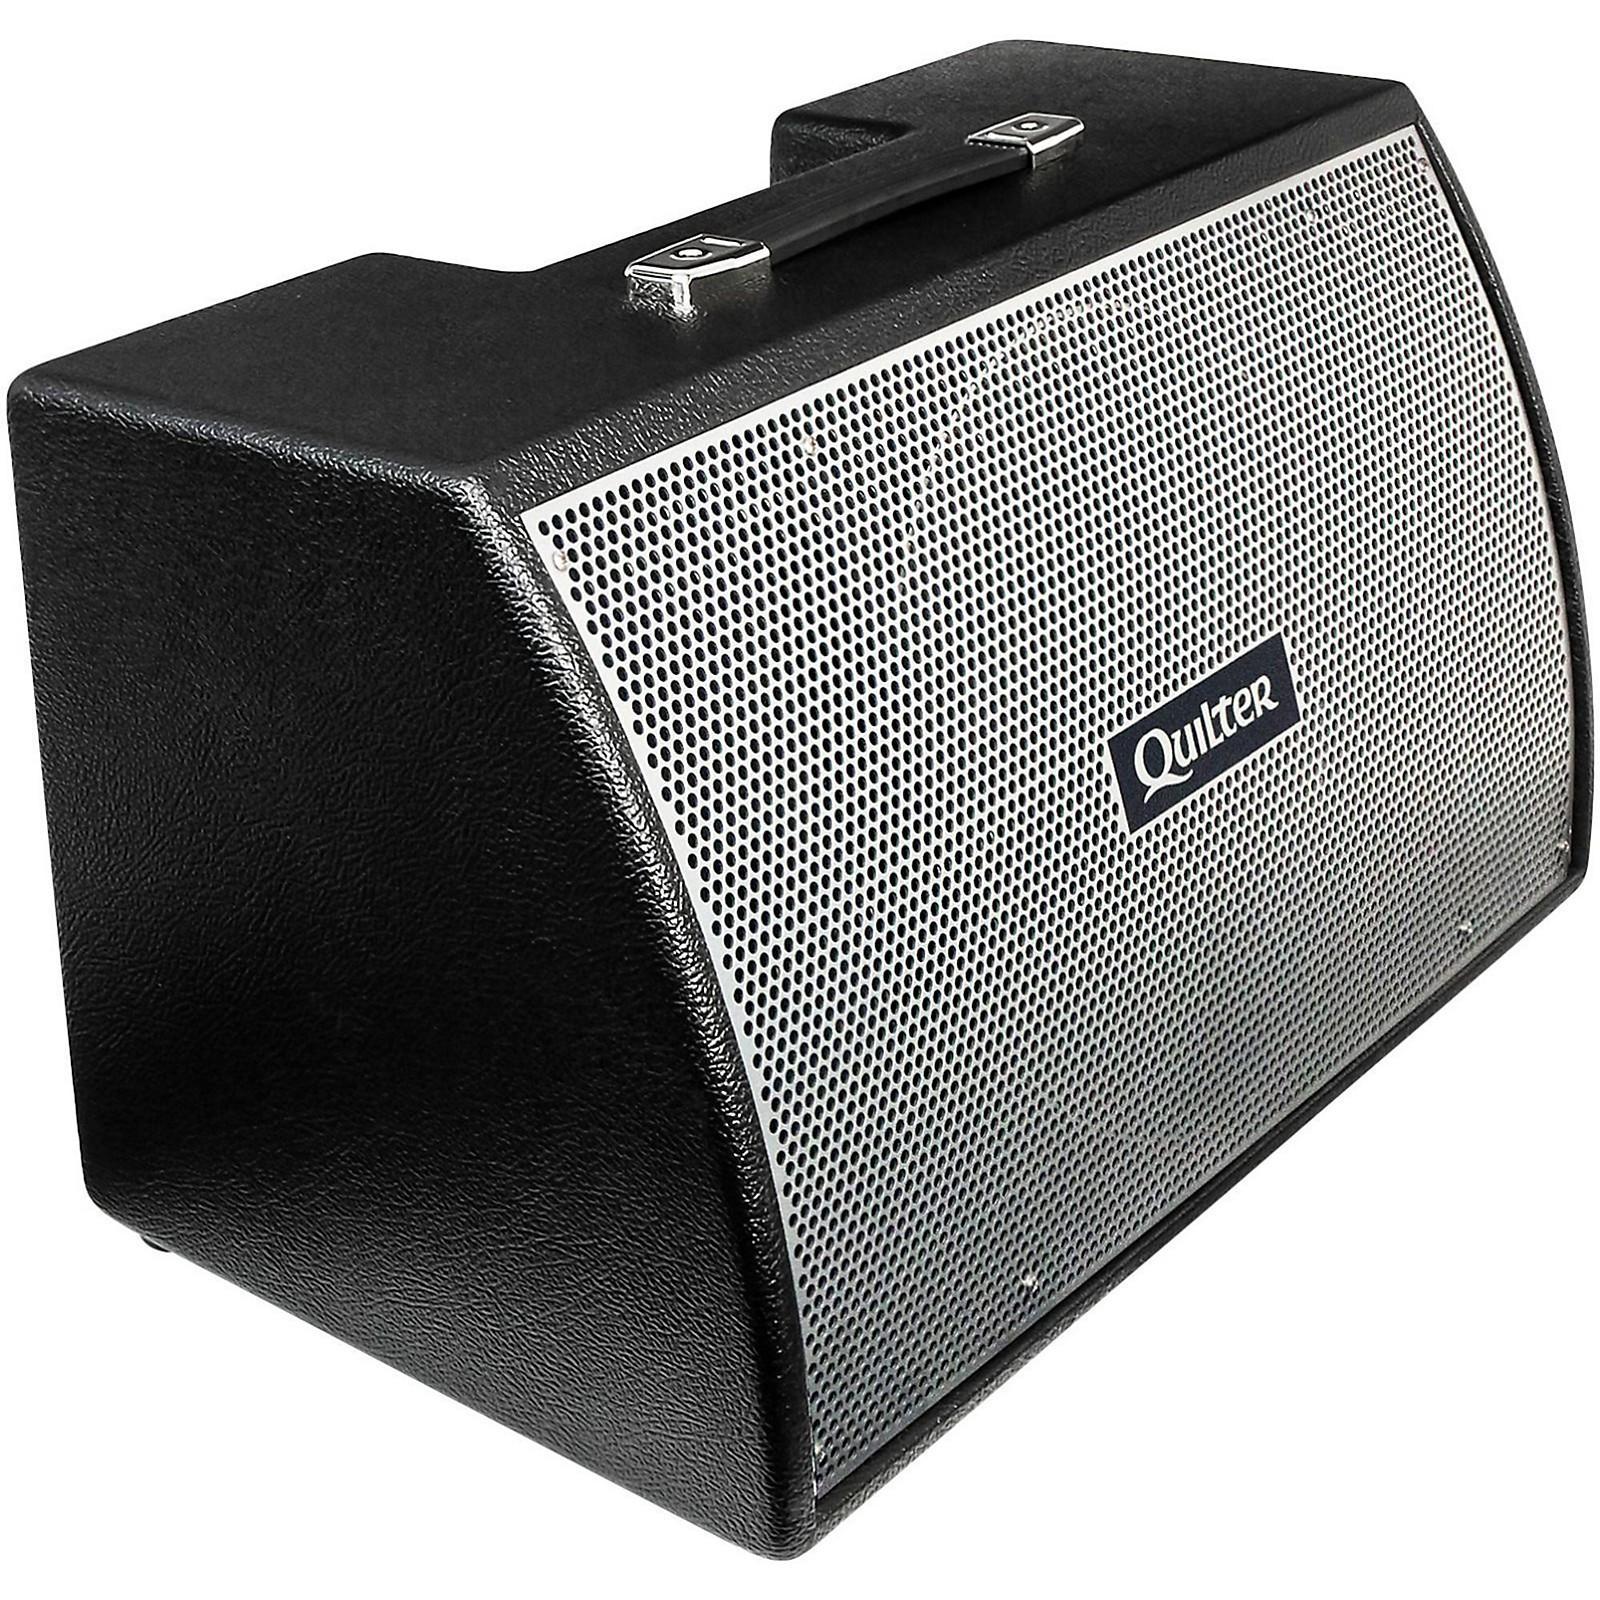 Quilter Labs Bassliner 1x12W Bass Speaker Cabinet